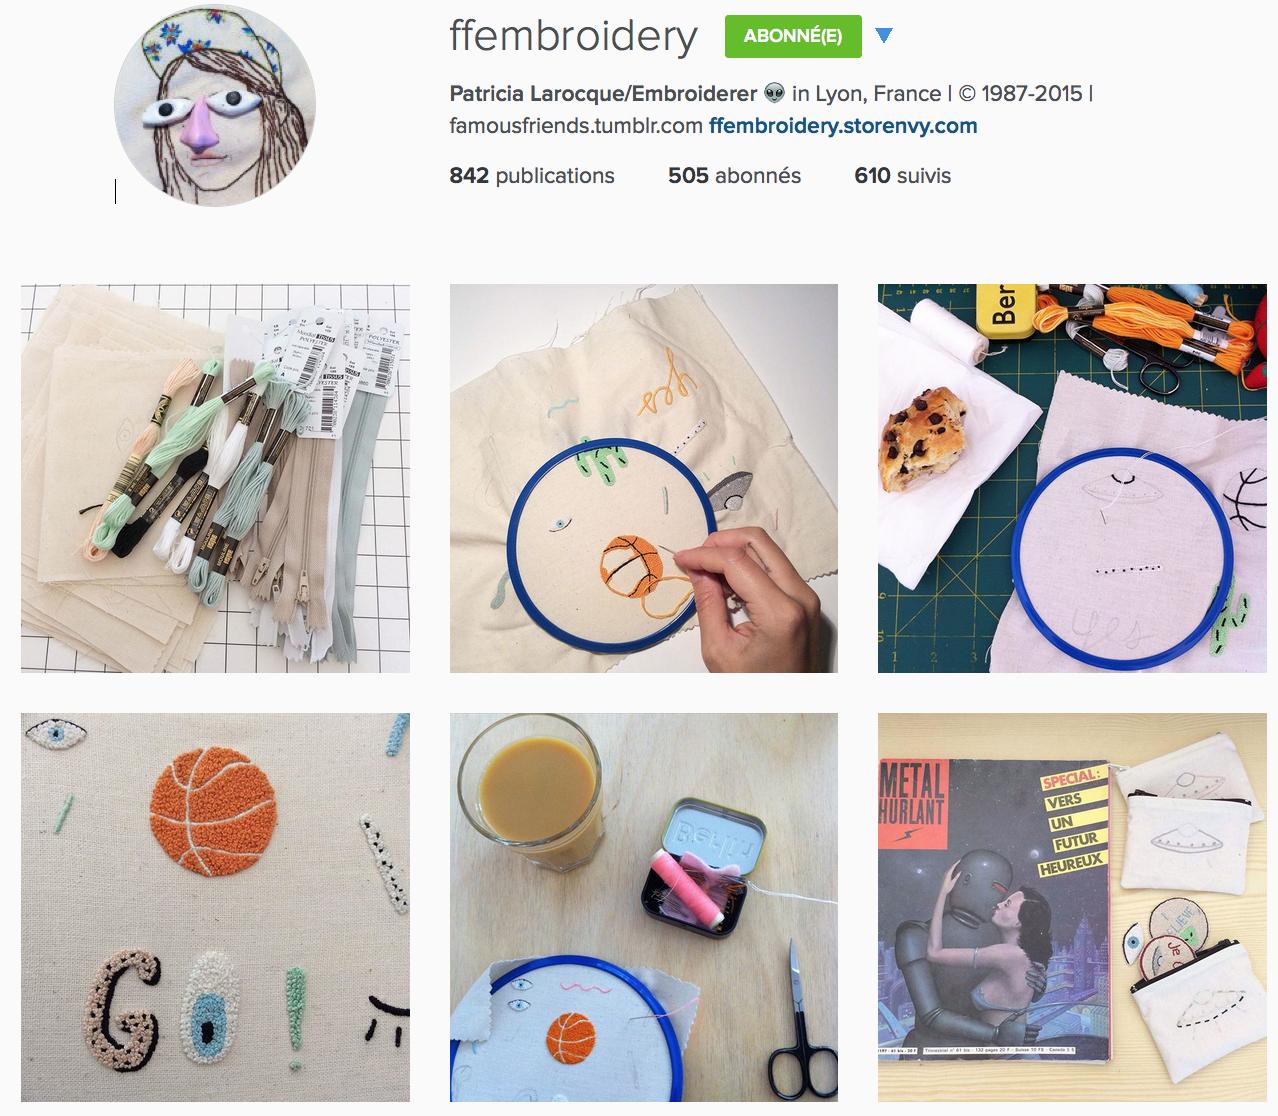 compte instagram de ffembroidery